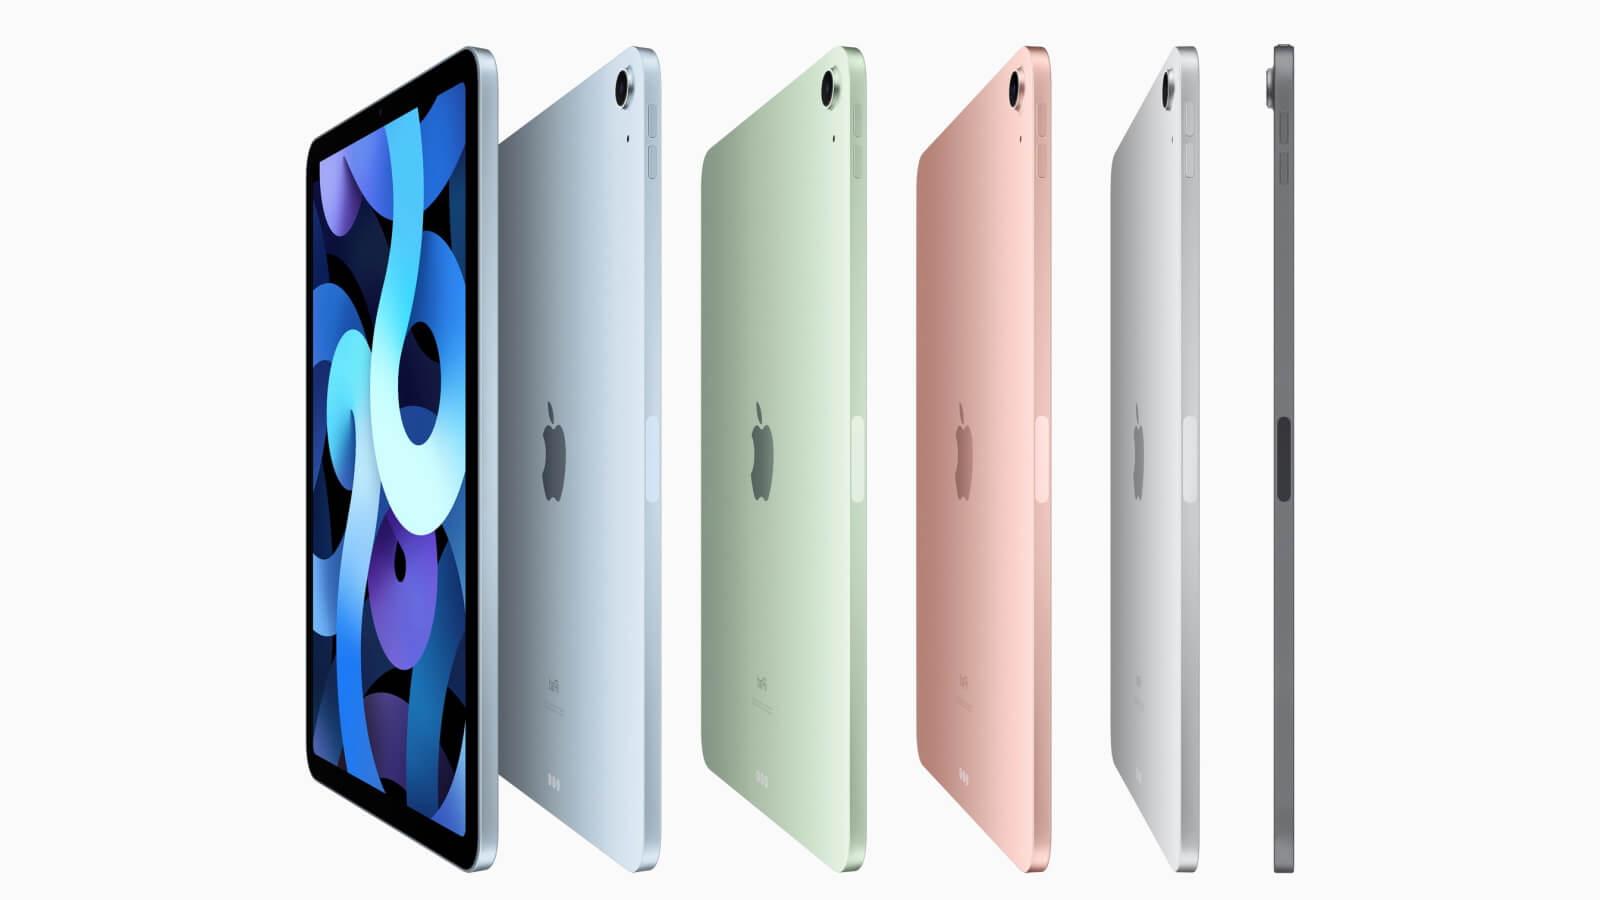 ipad air 2020 colors